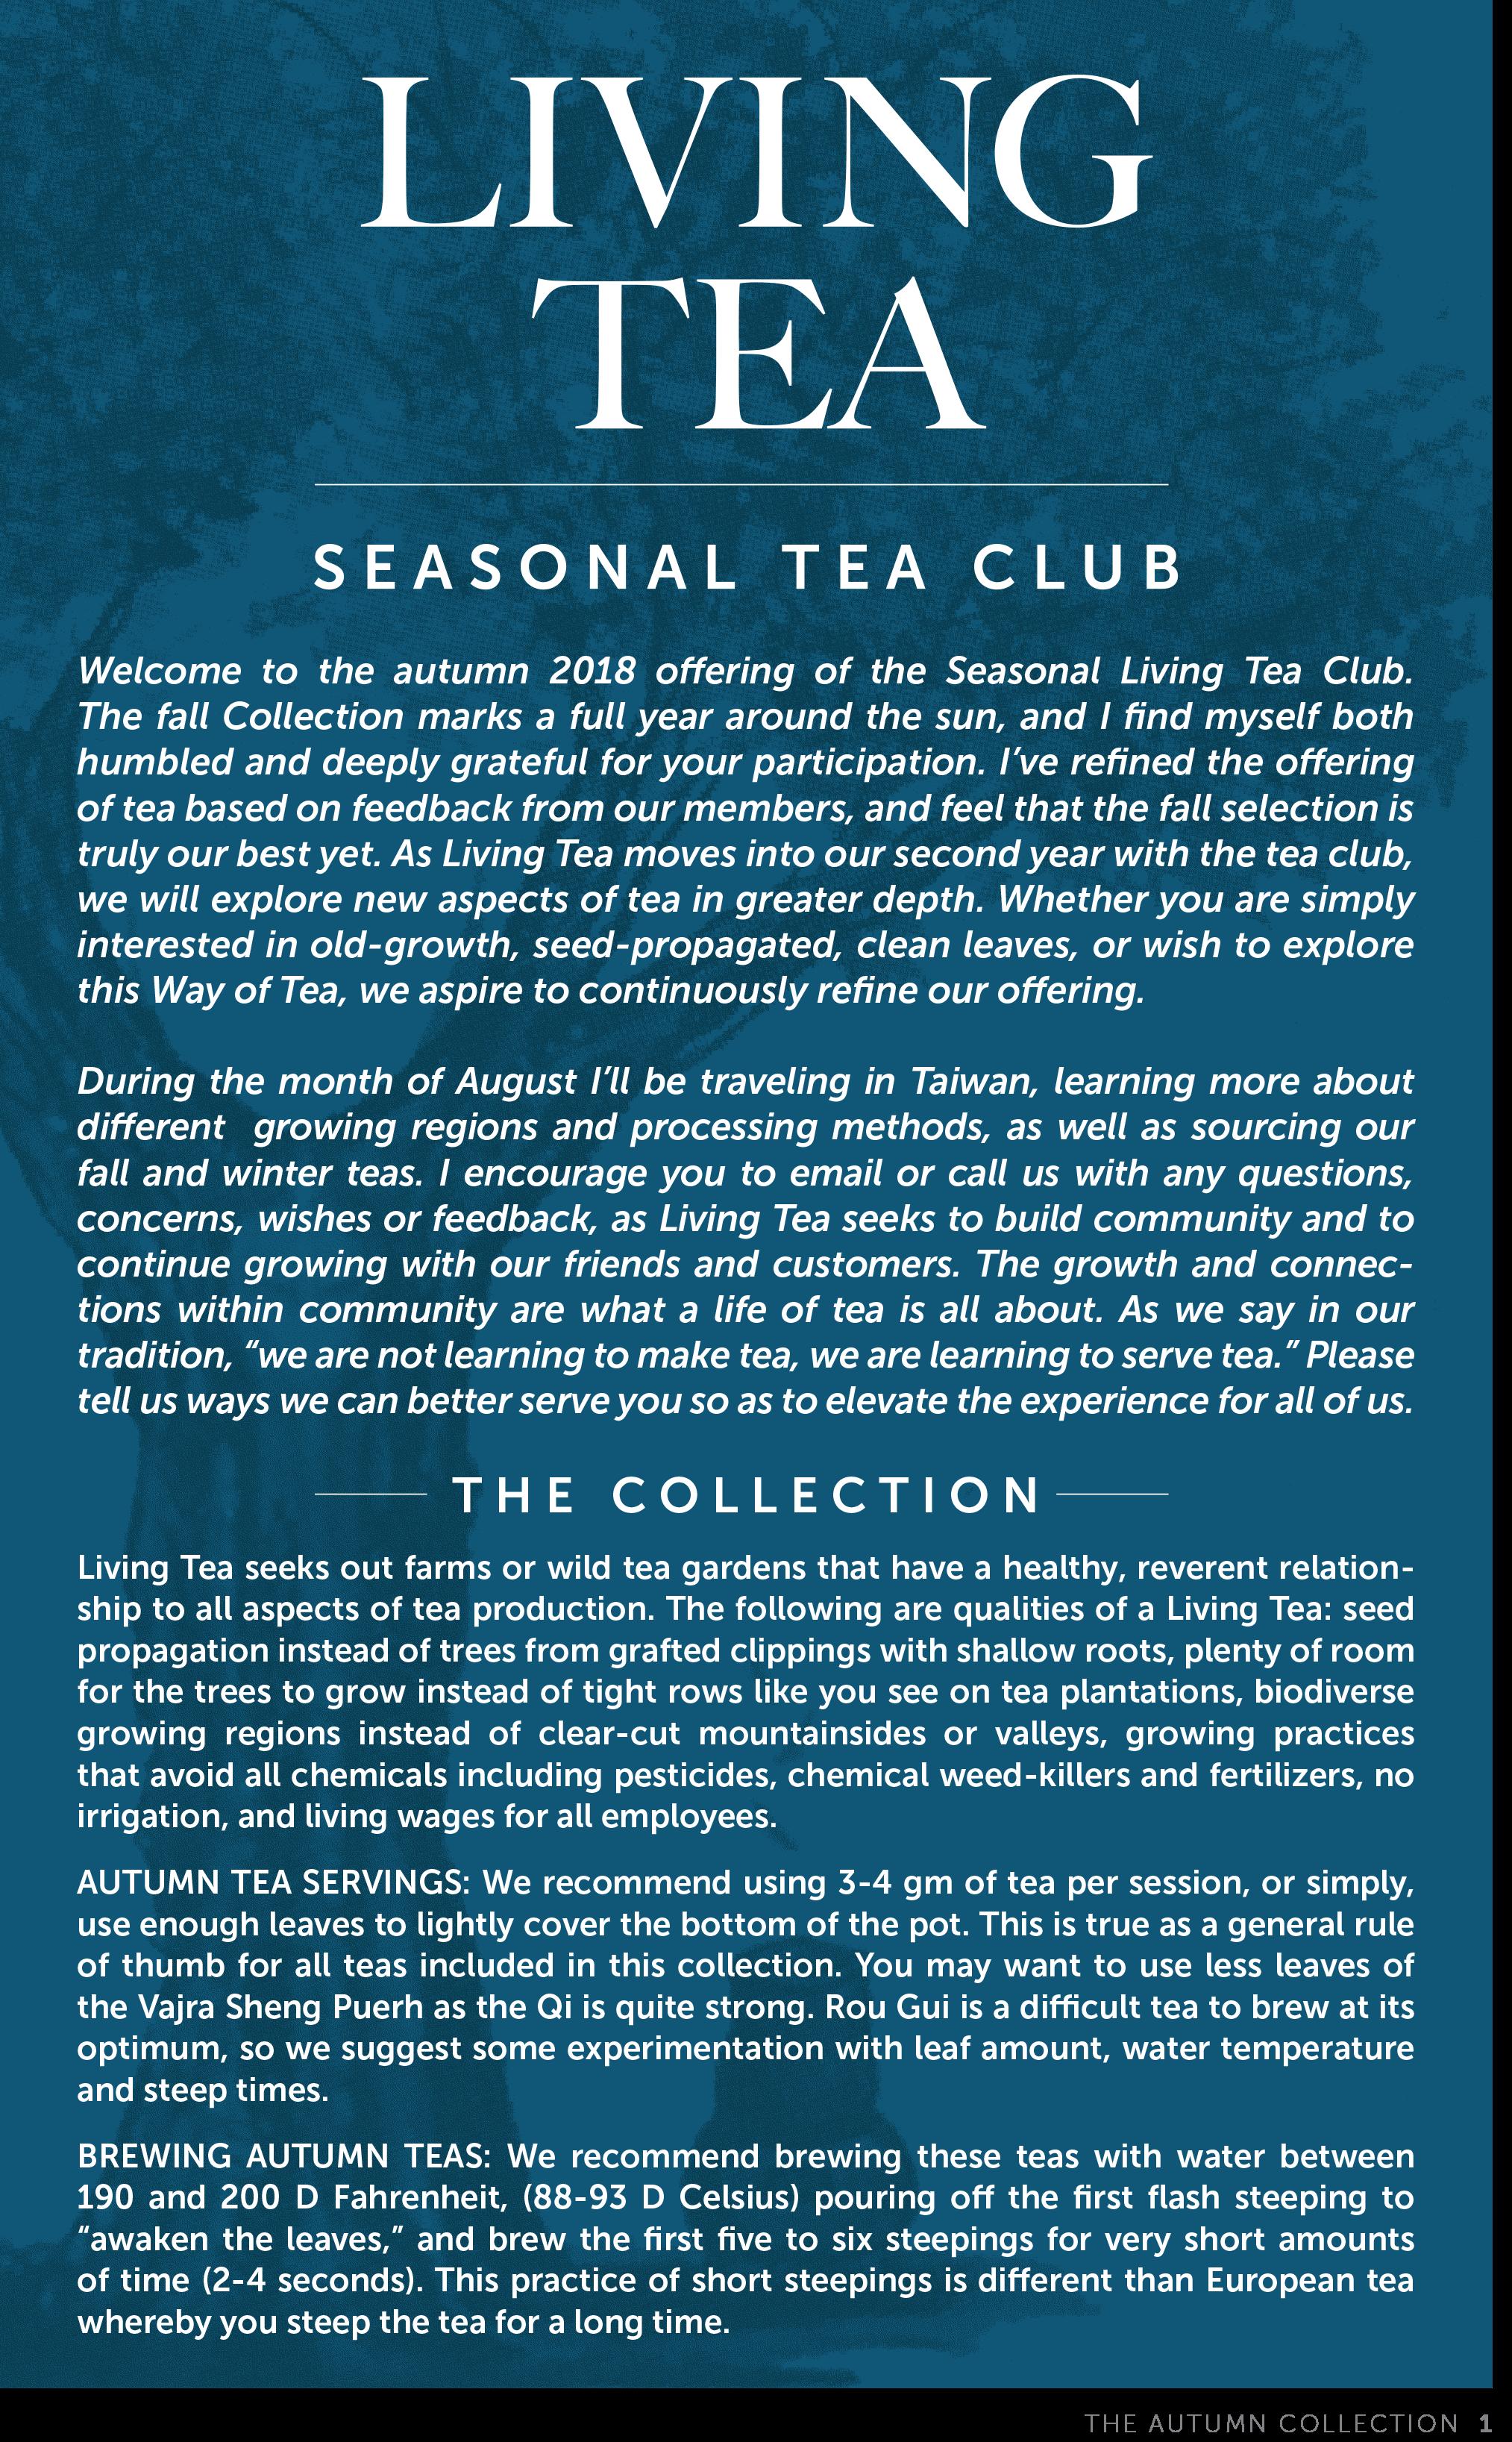 Living Tea Seasonal Tea Club Autumn 2018